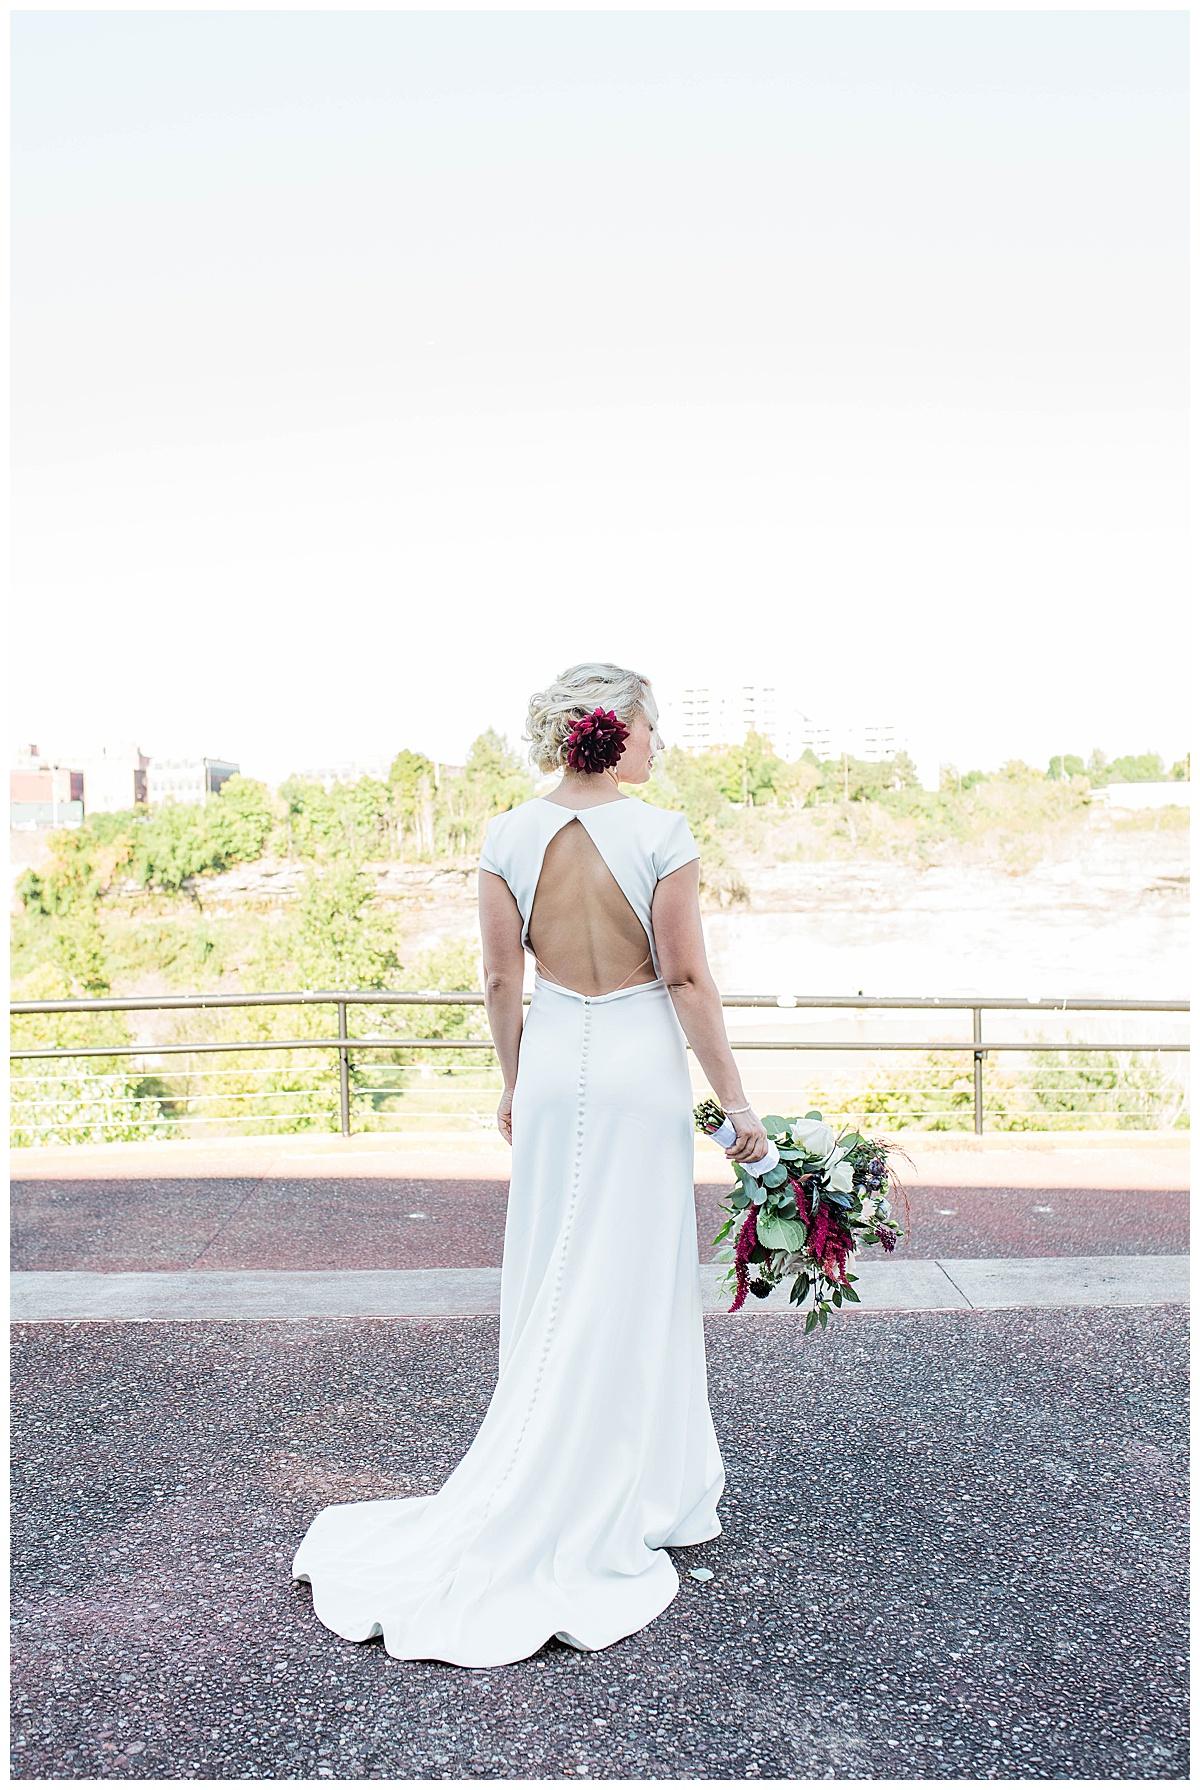 stella's bridal - Justin Alexander dress